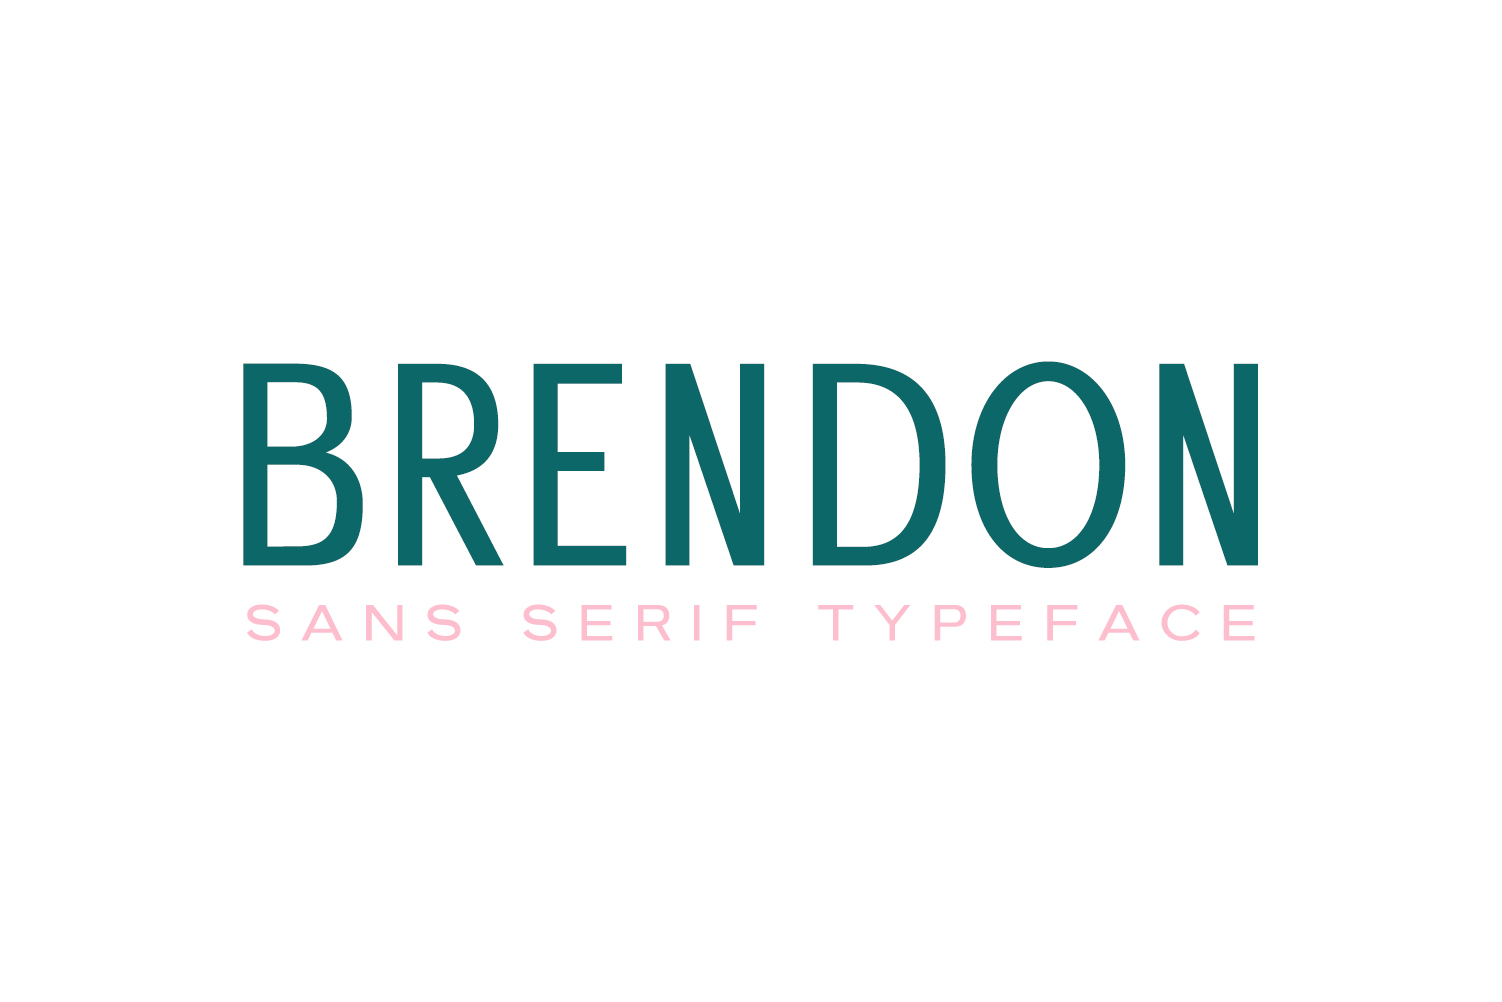 Brendon Sans Serif Typeface example image 1